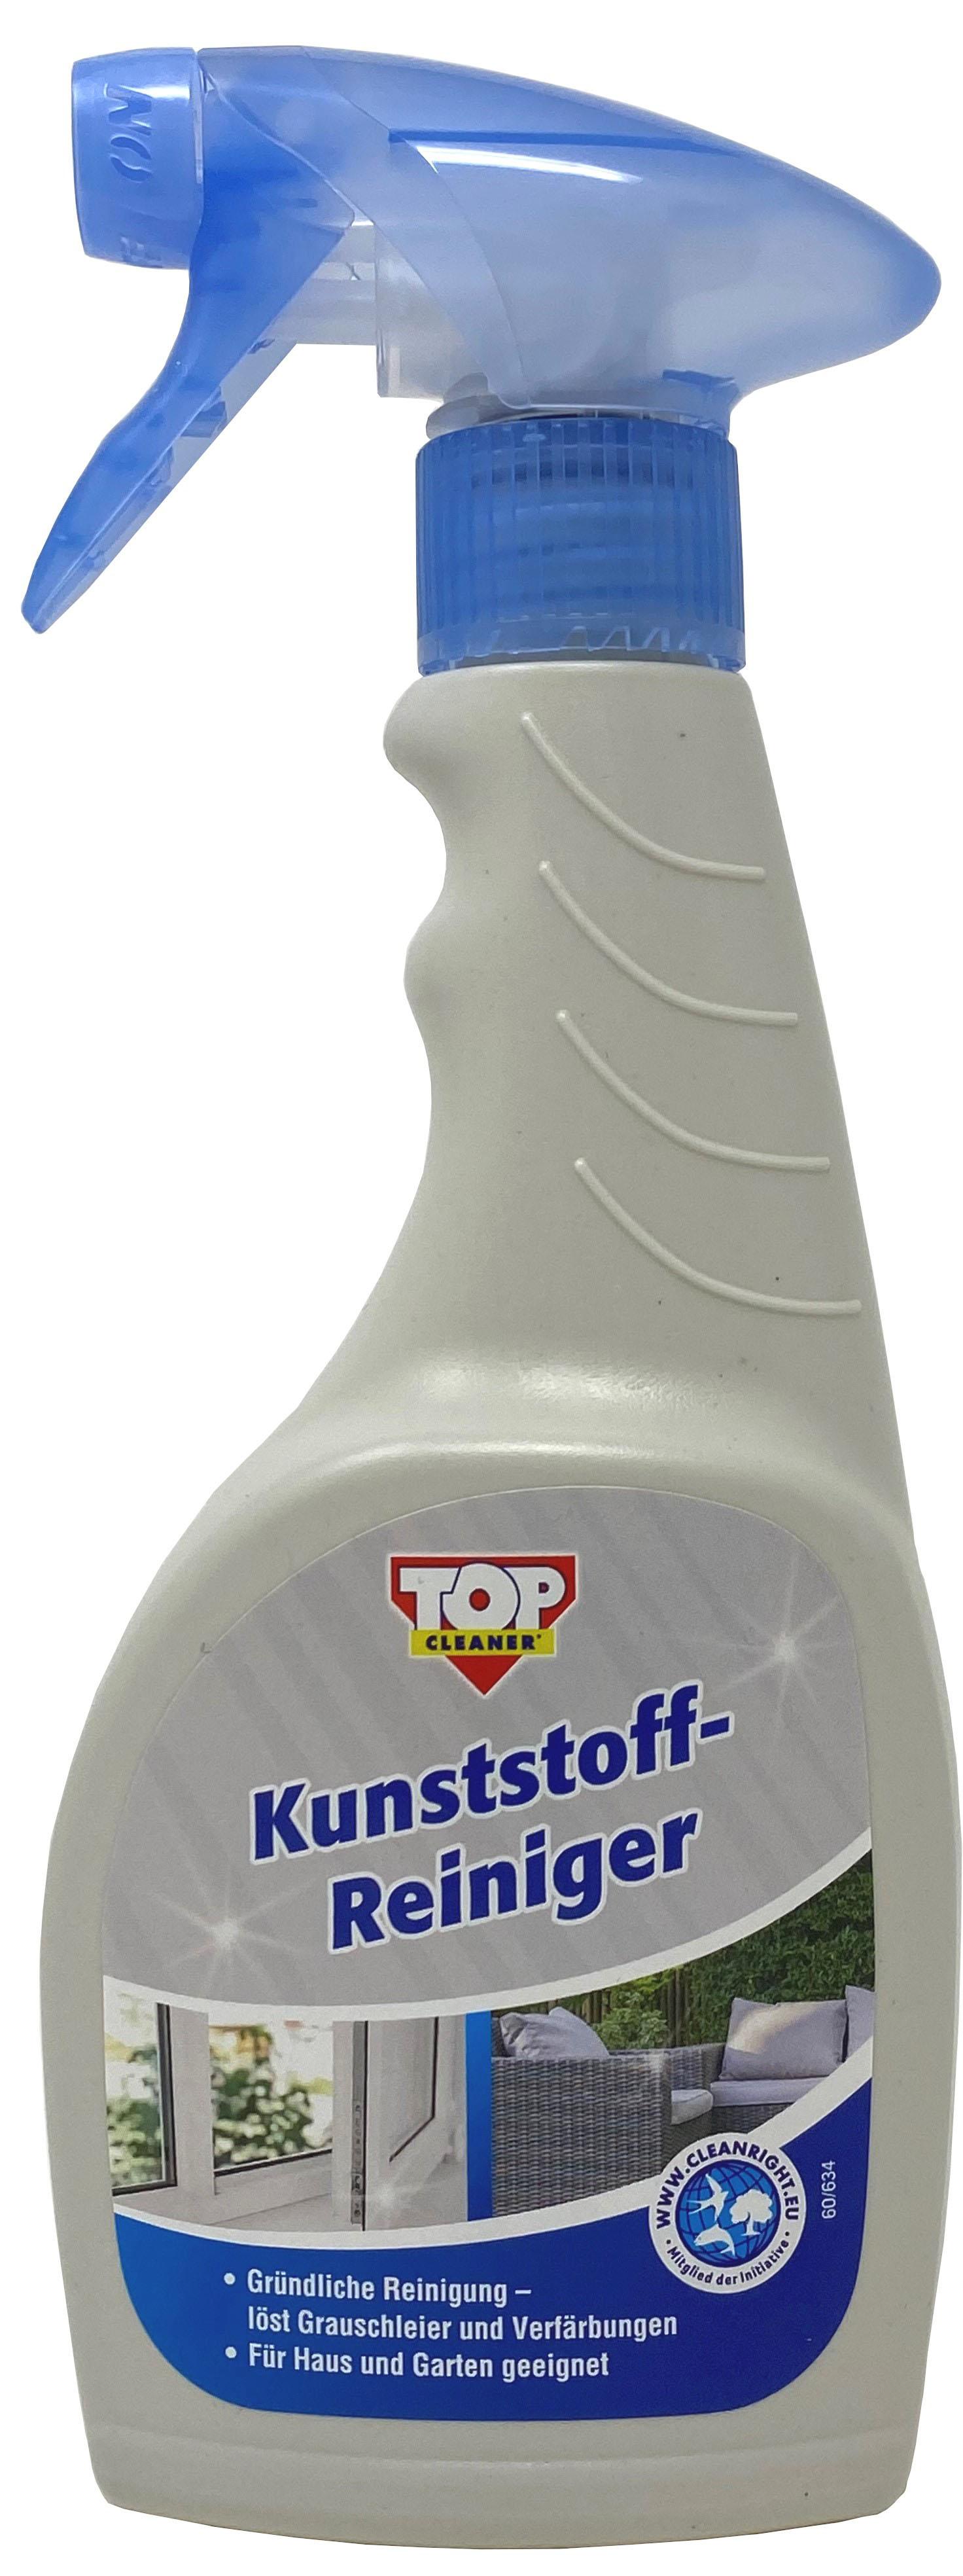 00465 - eco-fix Kunststoff Reiniger 500 ml